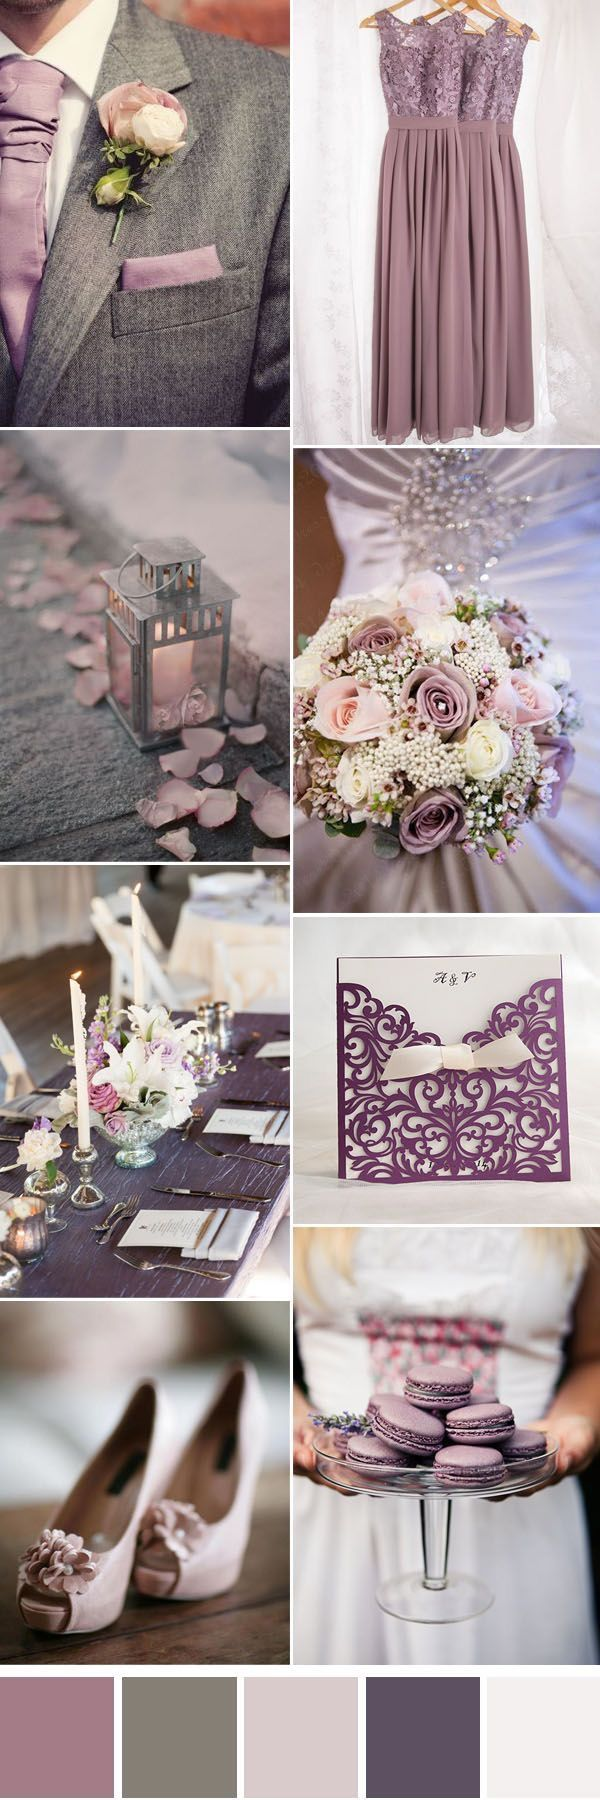 best my dream wedding images on pinterest wedding ideas